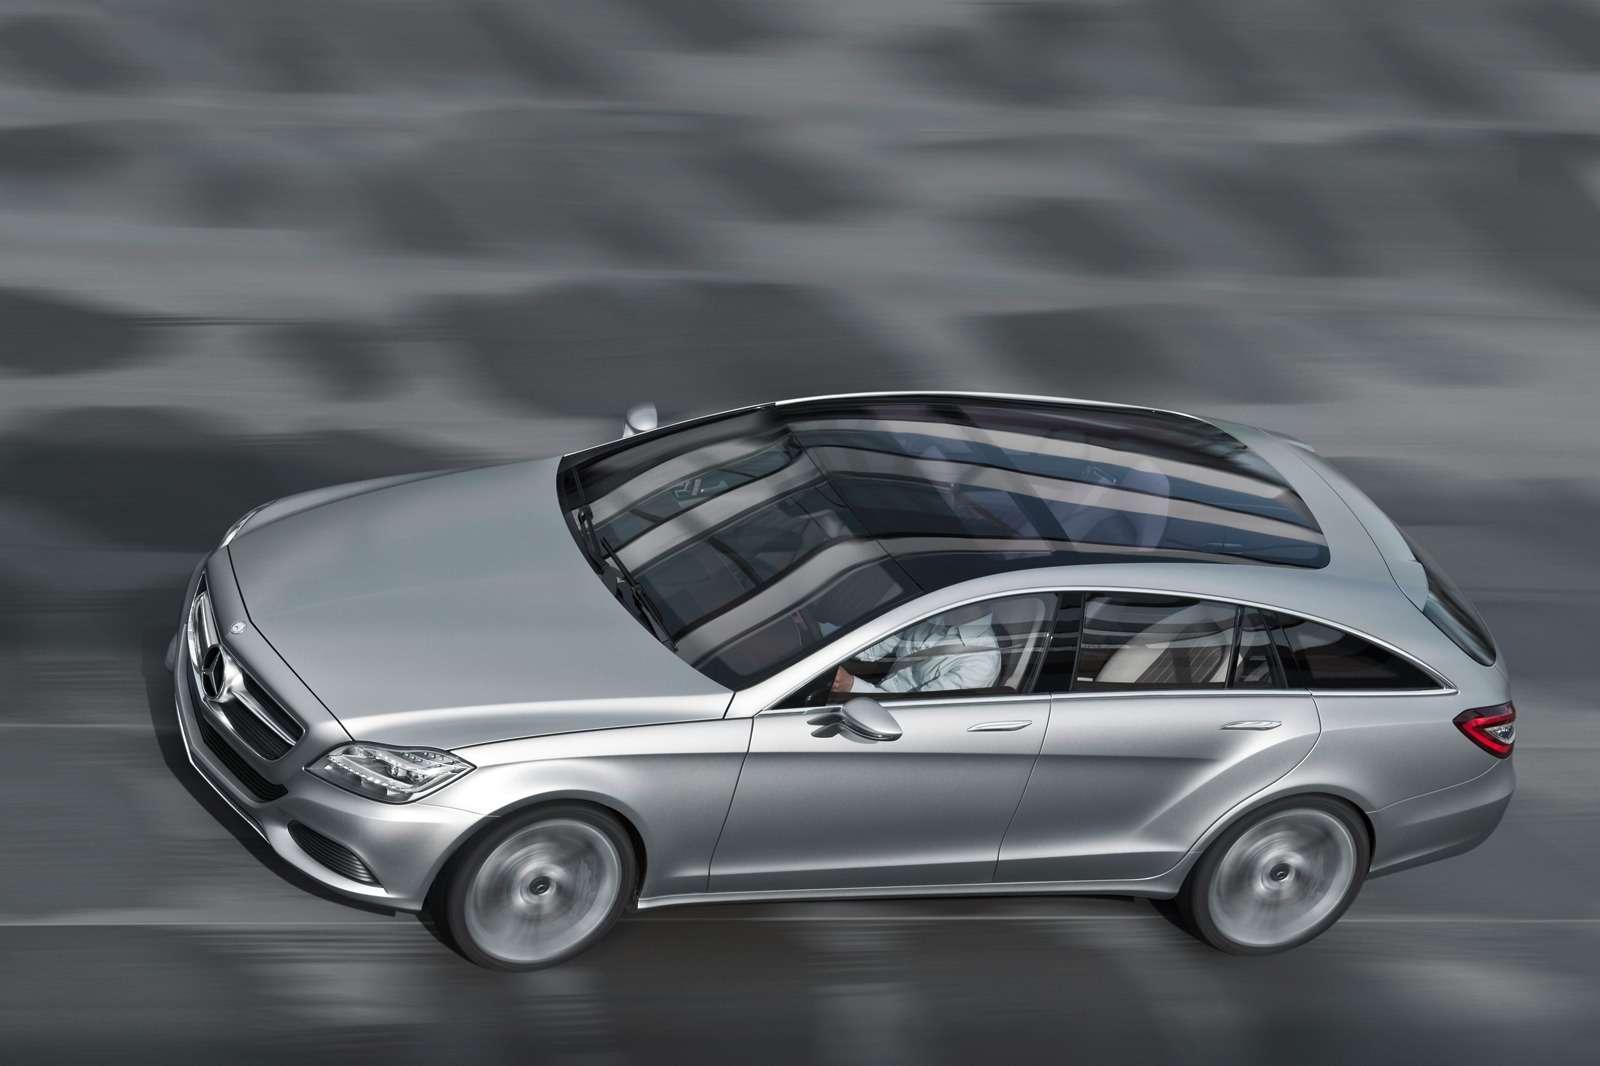 Mercedes CLS Shooting Brake oficjalnie listopad 2010